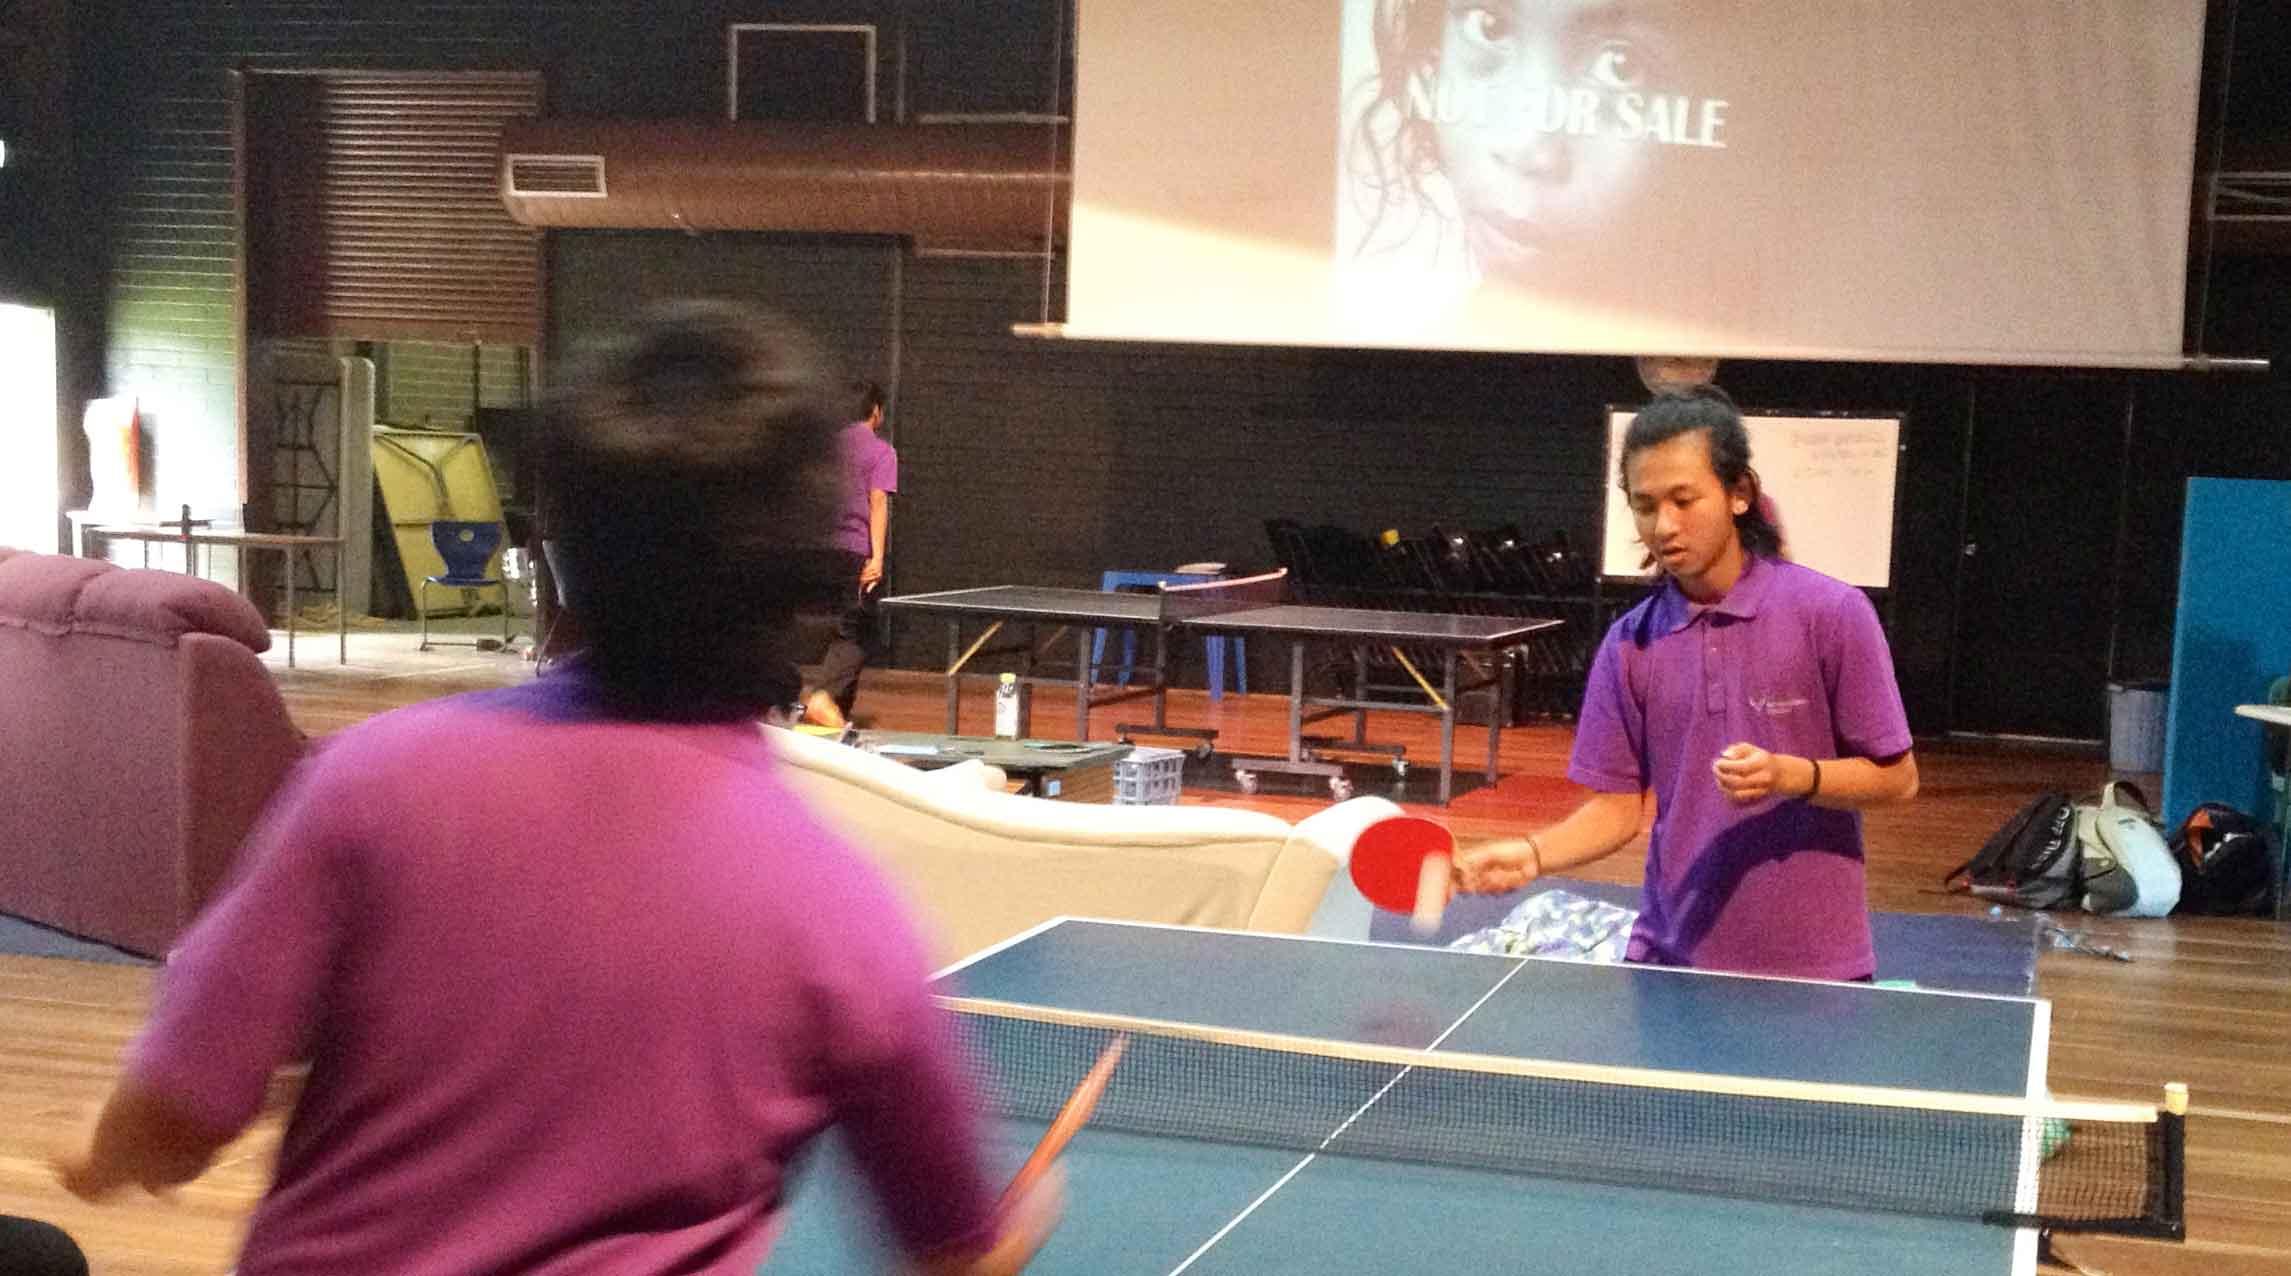 Fighting Sexual Exploitation Through Table Tennis